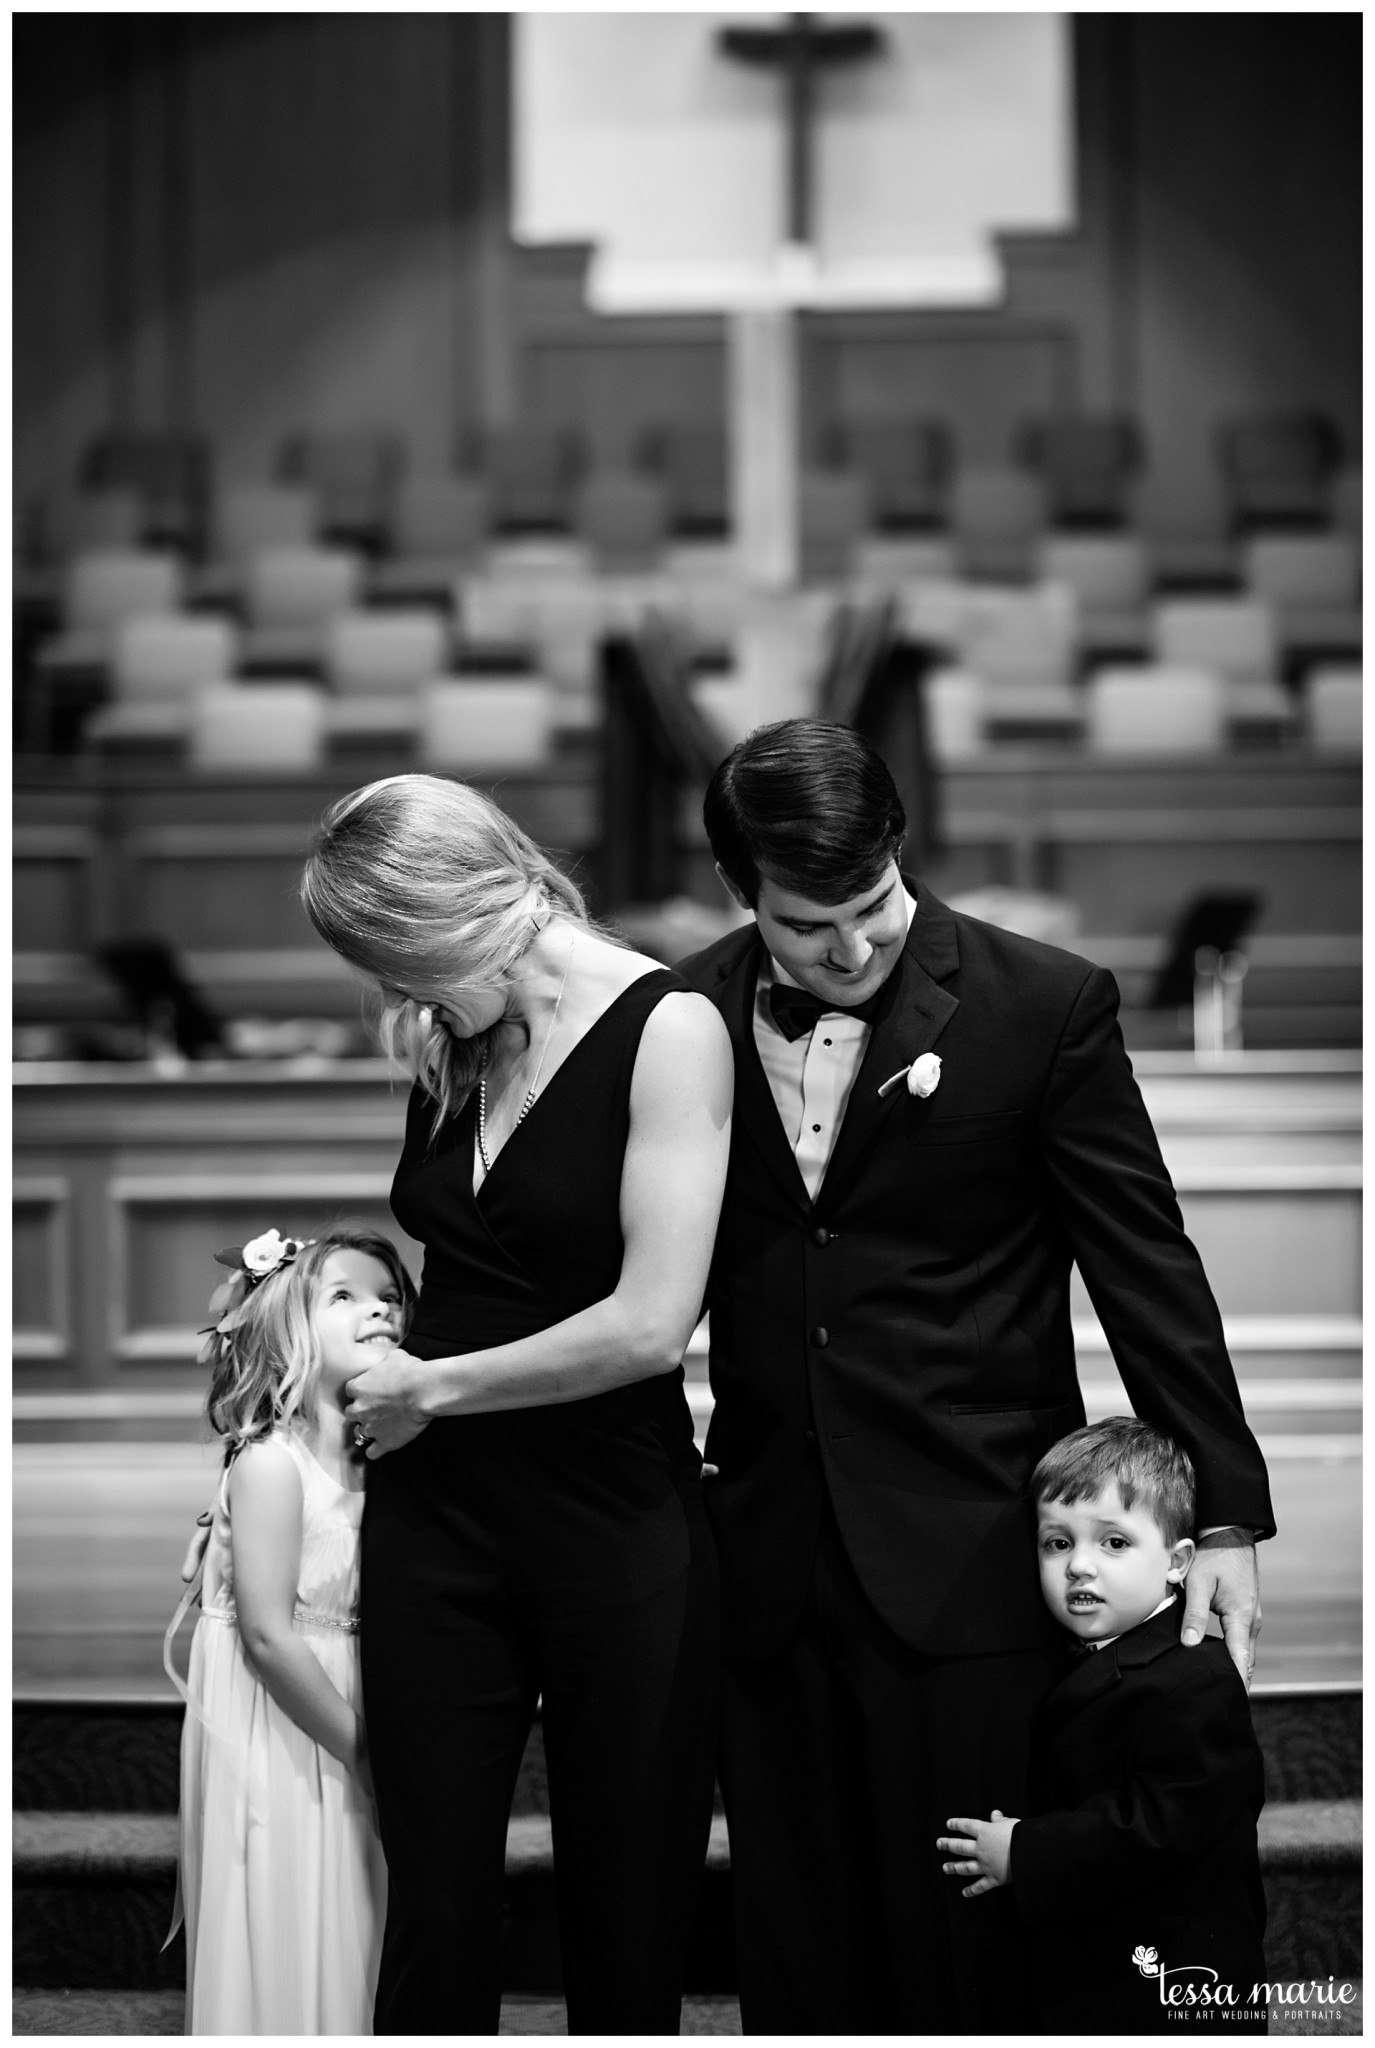 tessa_marie_weddings_legacy_story_focused_wedding_pictures_atlanta_wedding_photographer_0131